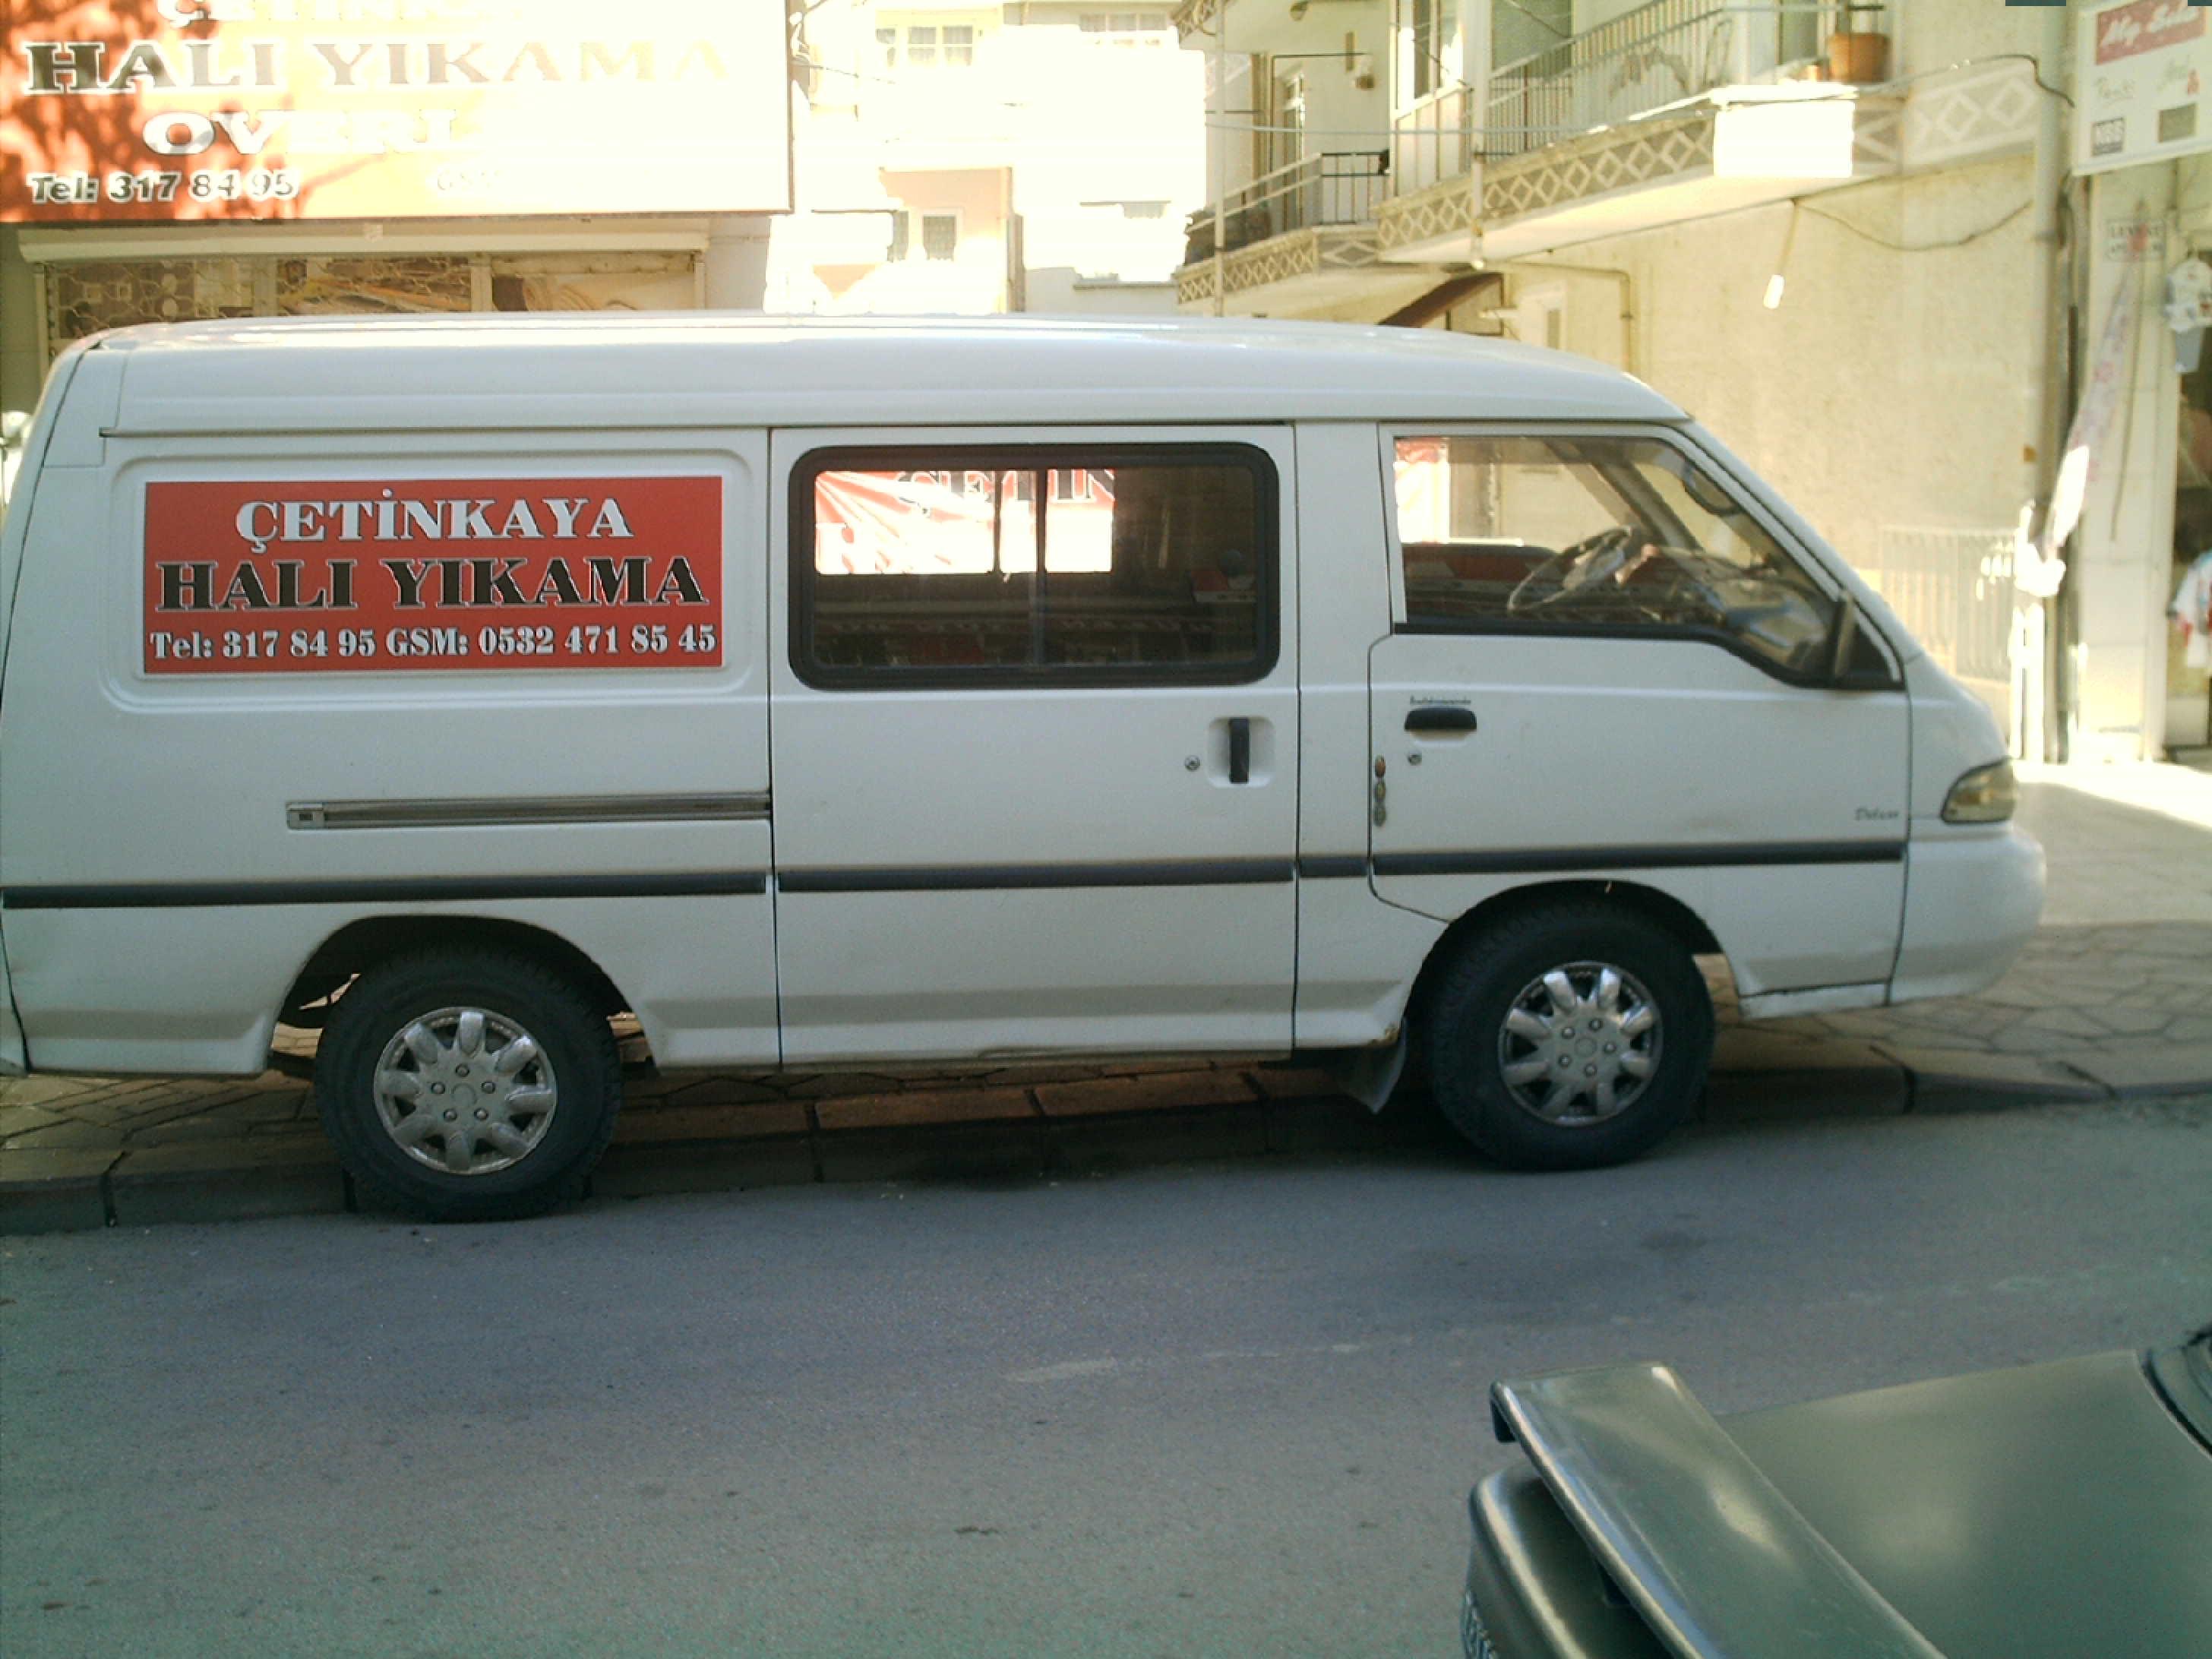 çamlıca_hali_yikama_servis_araci